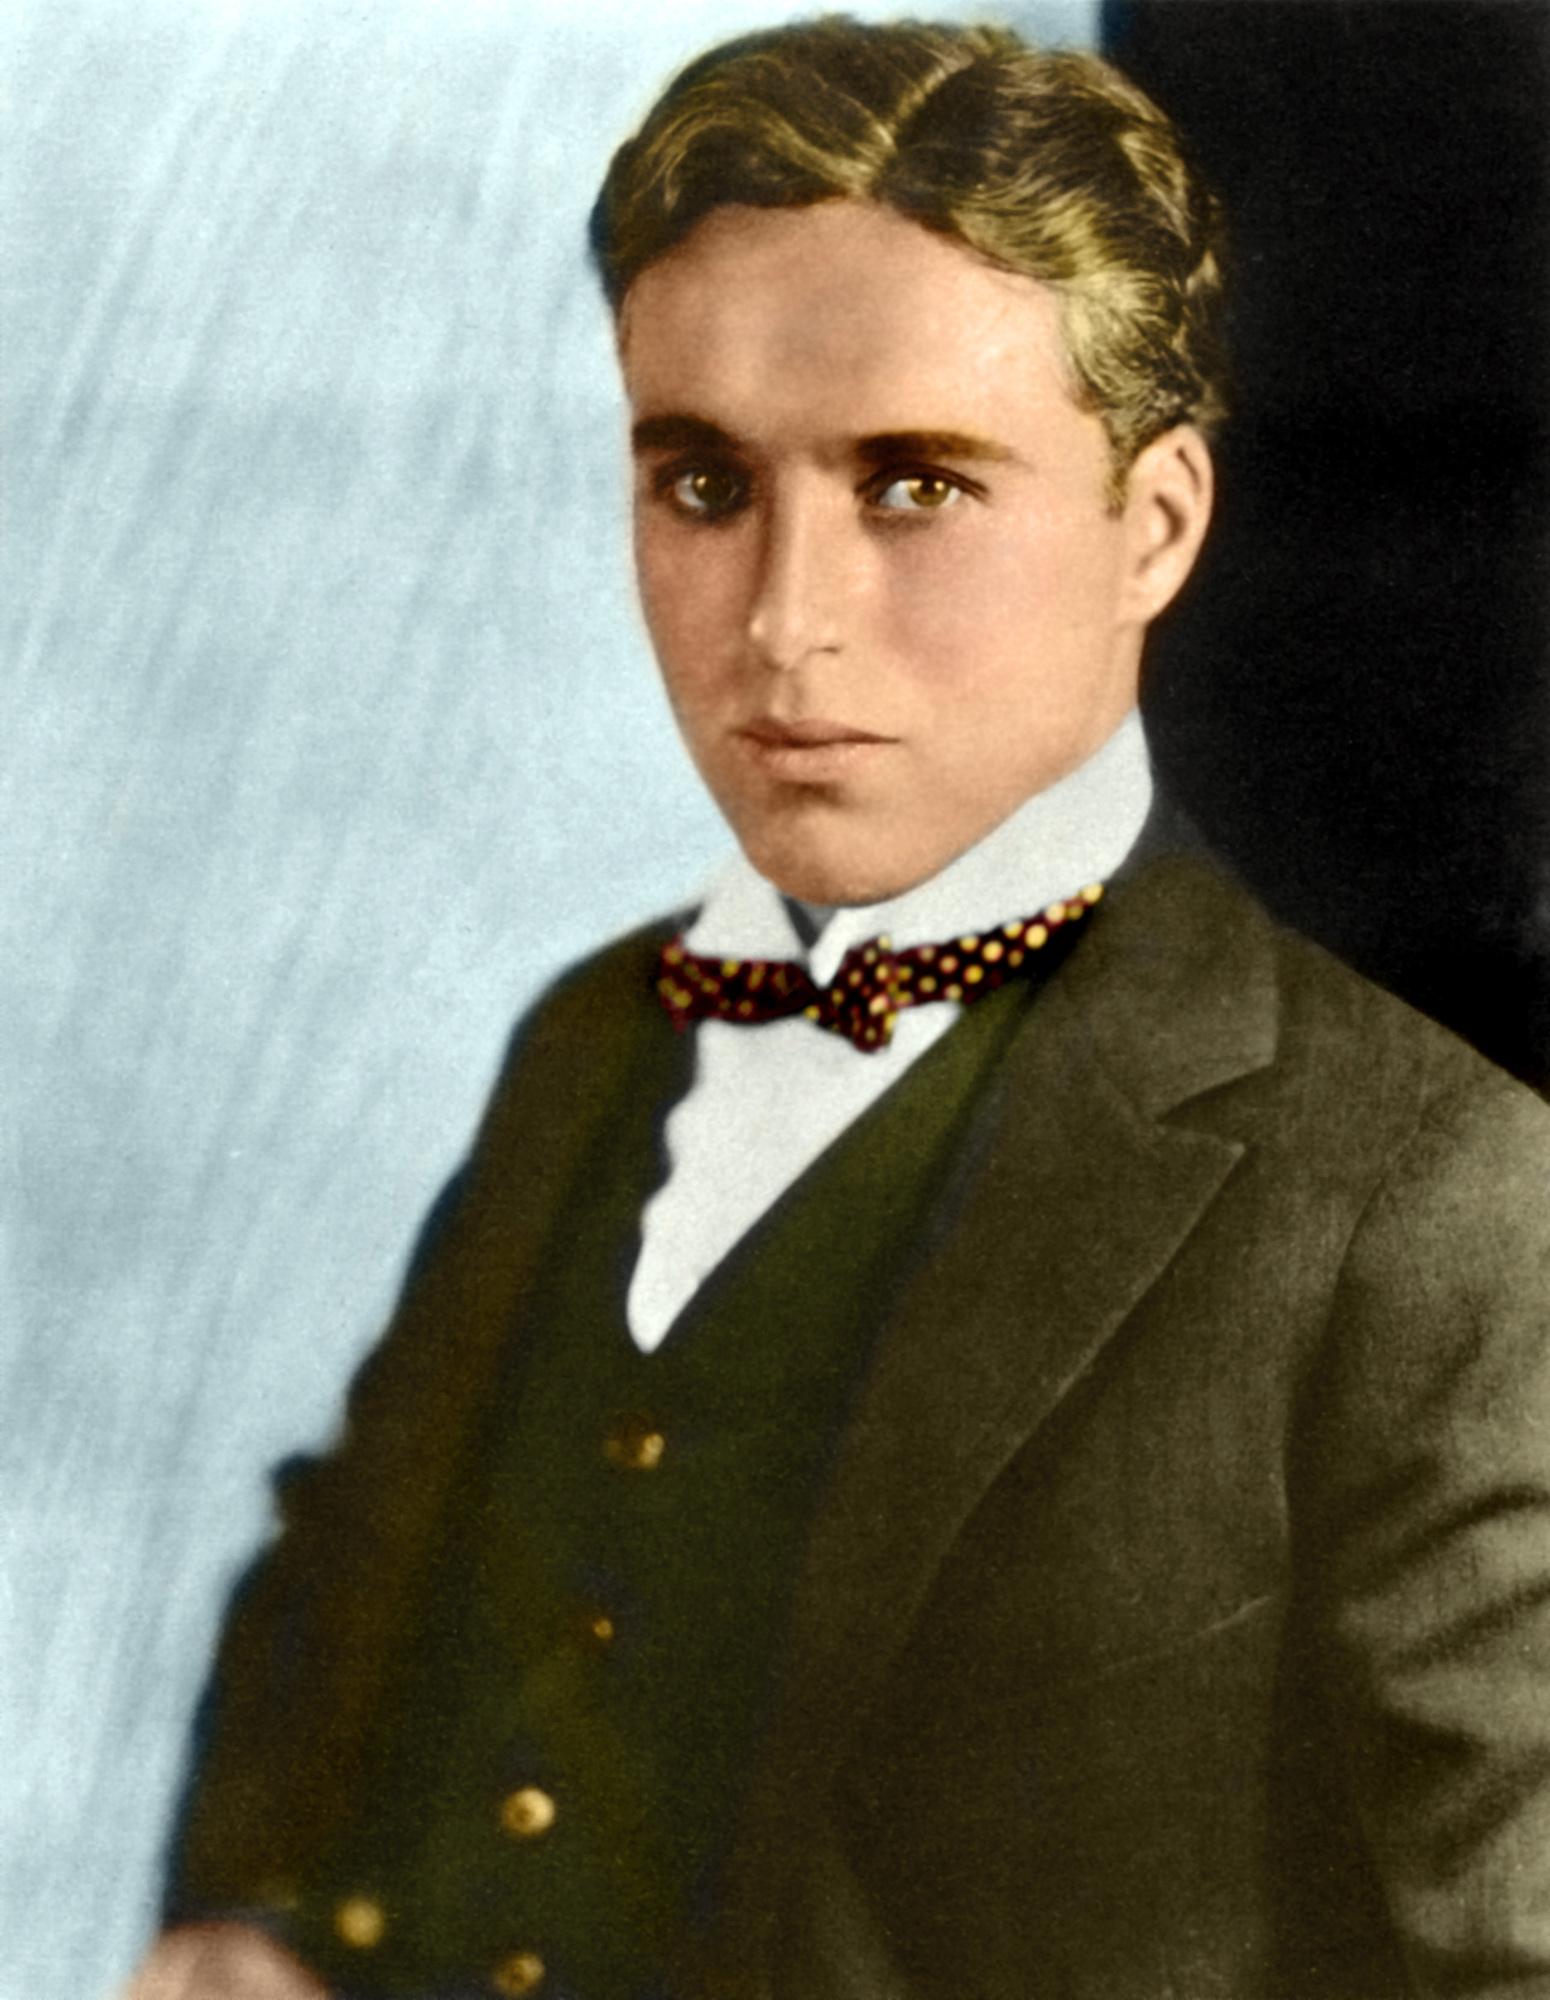 Sahar Tabar Images >> Charlie Chaplin - Silent Movies Photo (13775685) - Fanpop